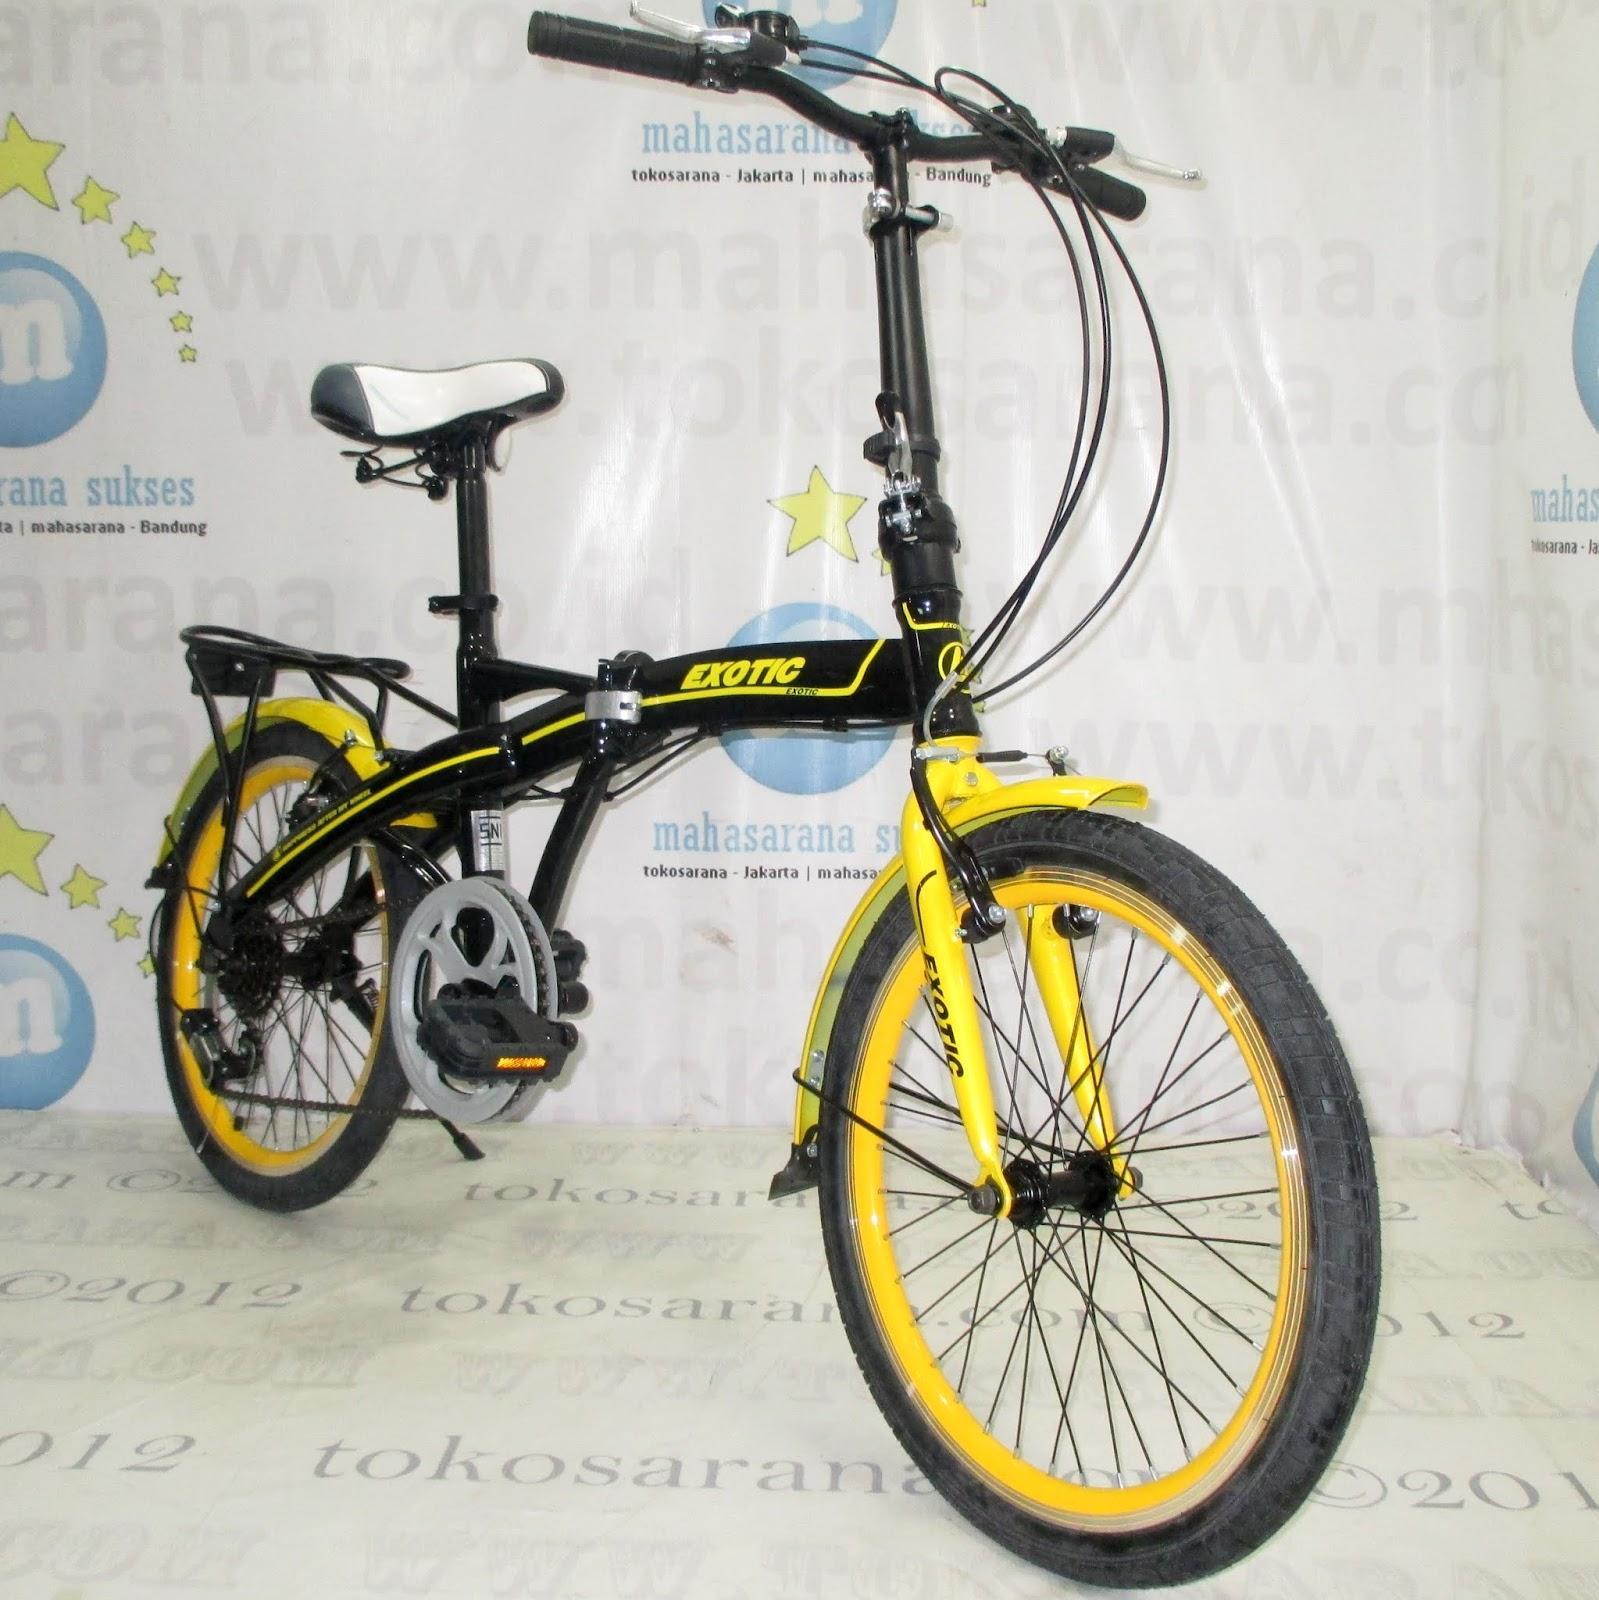 tokosarana™ Mahasarana Sukses™ Sepeda Lipat Exotic ET20